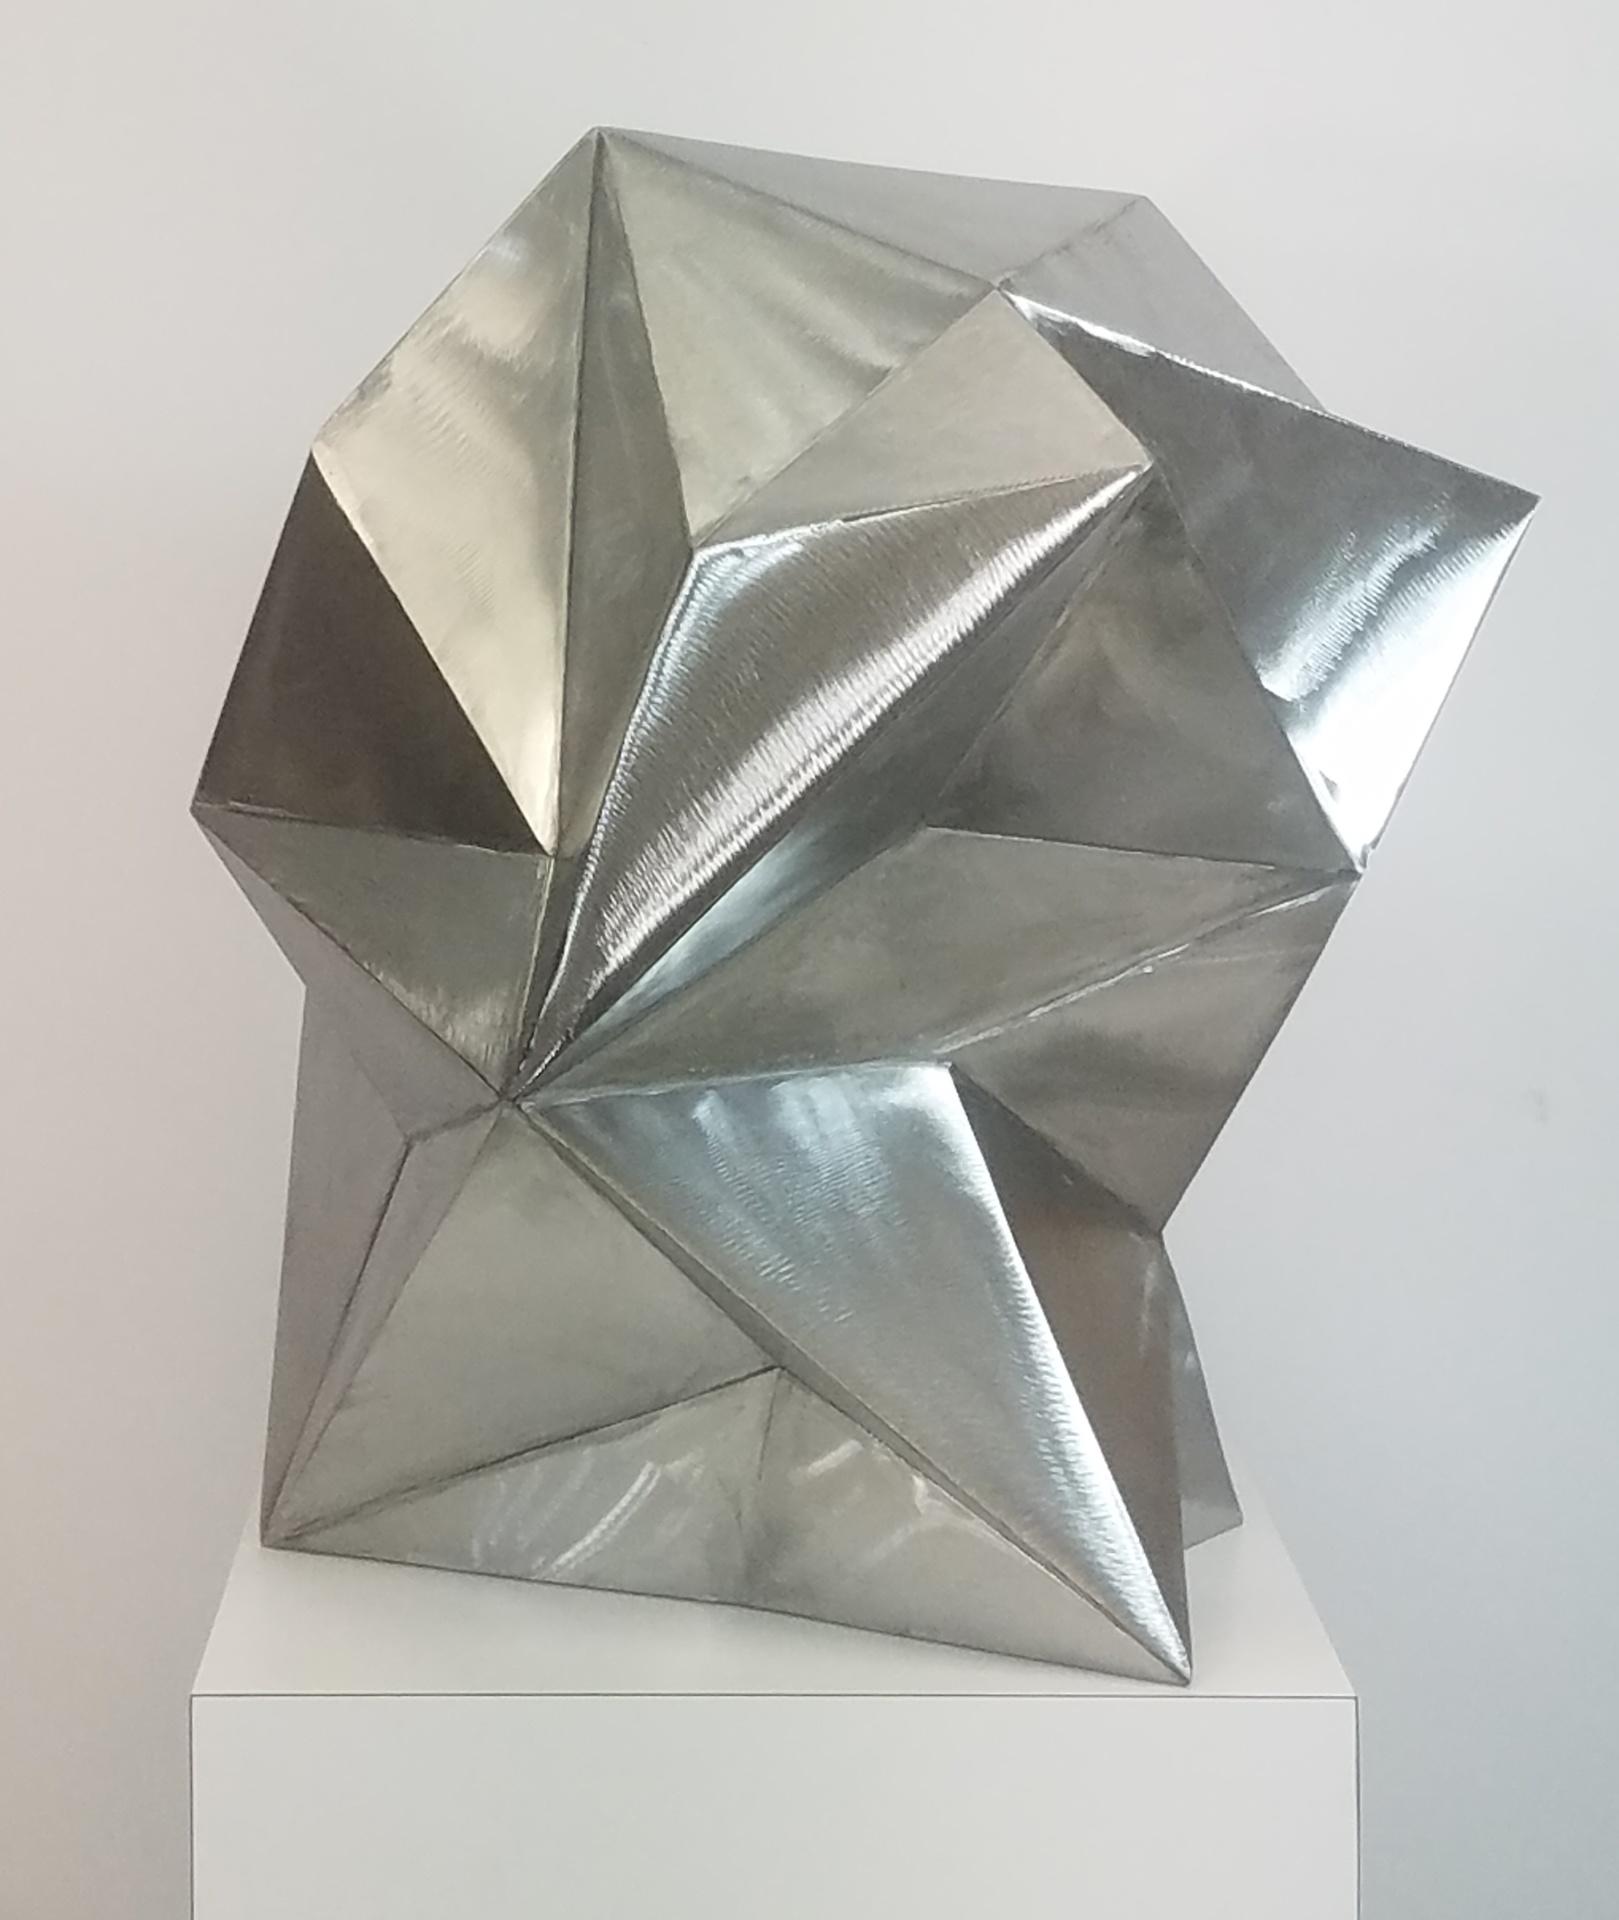 SASSOON KOSIAN  - Cranford, NJ   Belief System   steel, $2,500